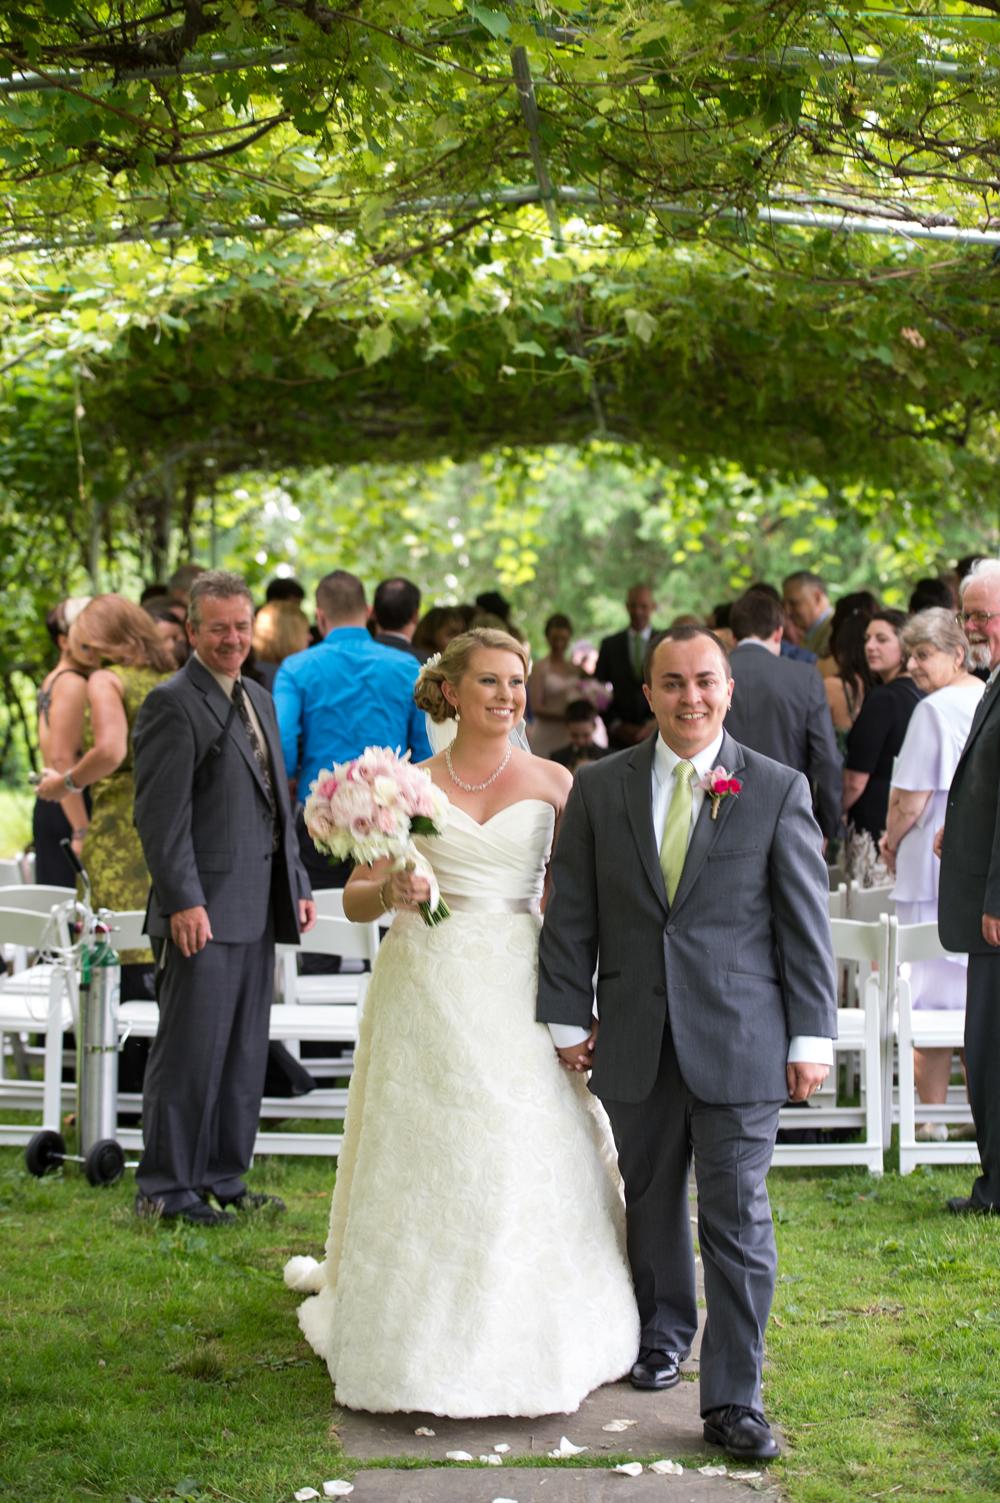 Tarrywile-Mansion-Wedding-Greg-Lewis-Photo-57